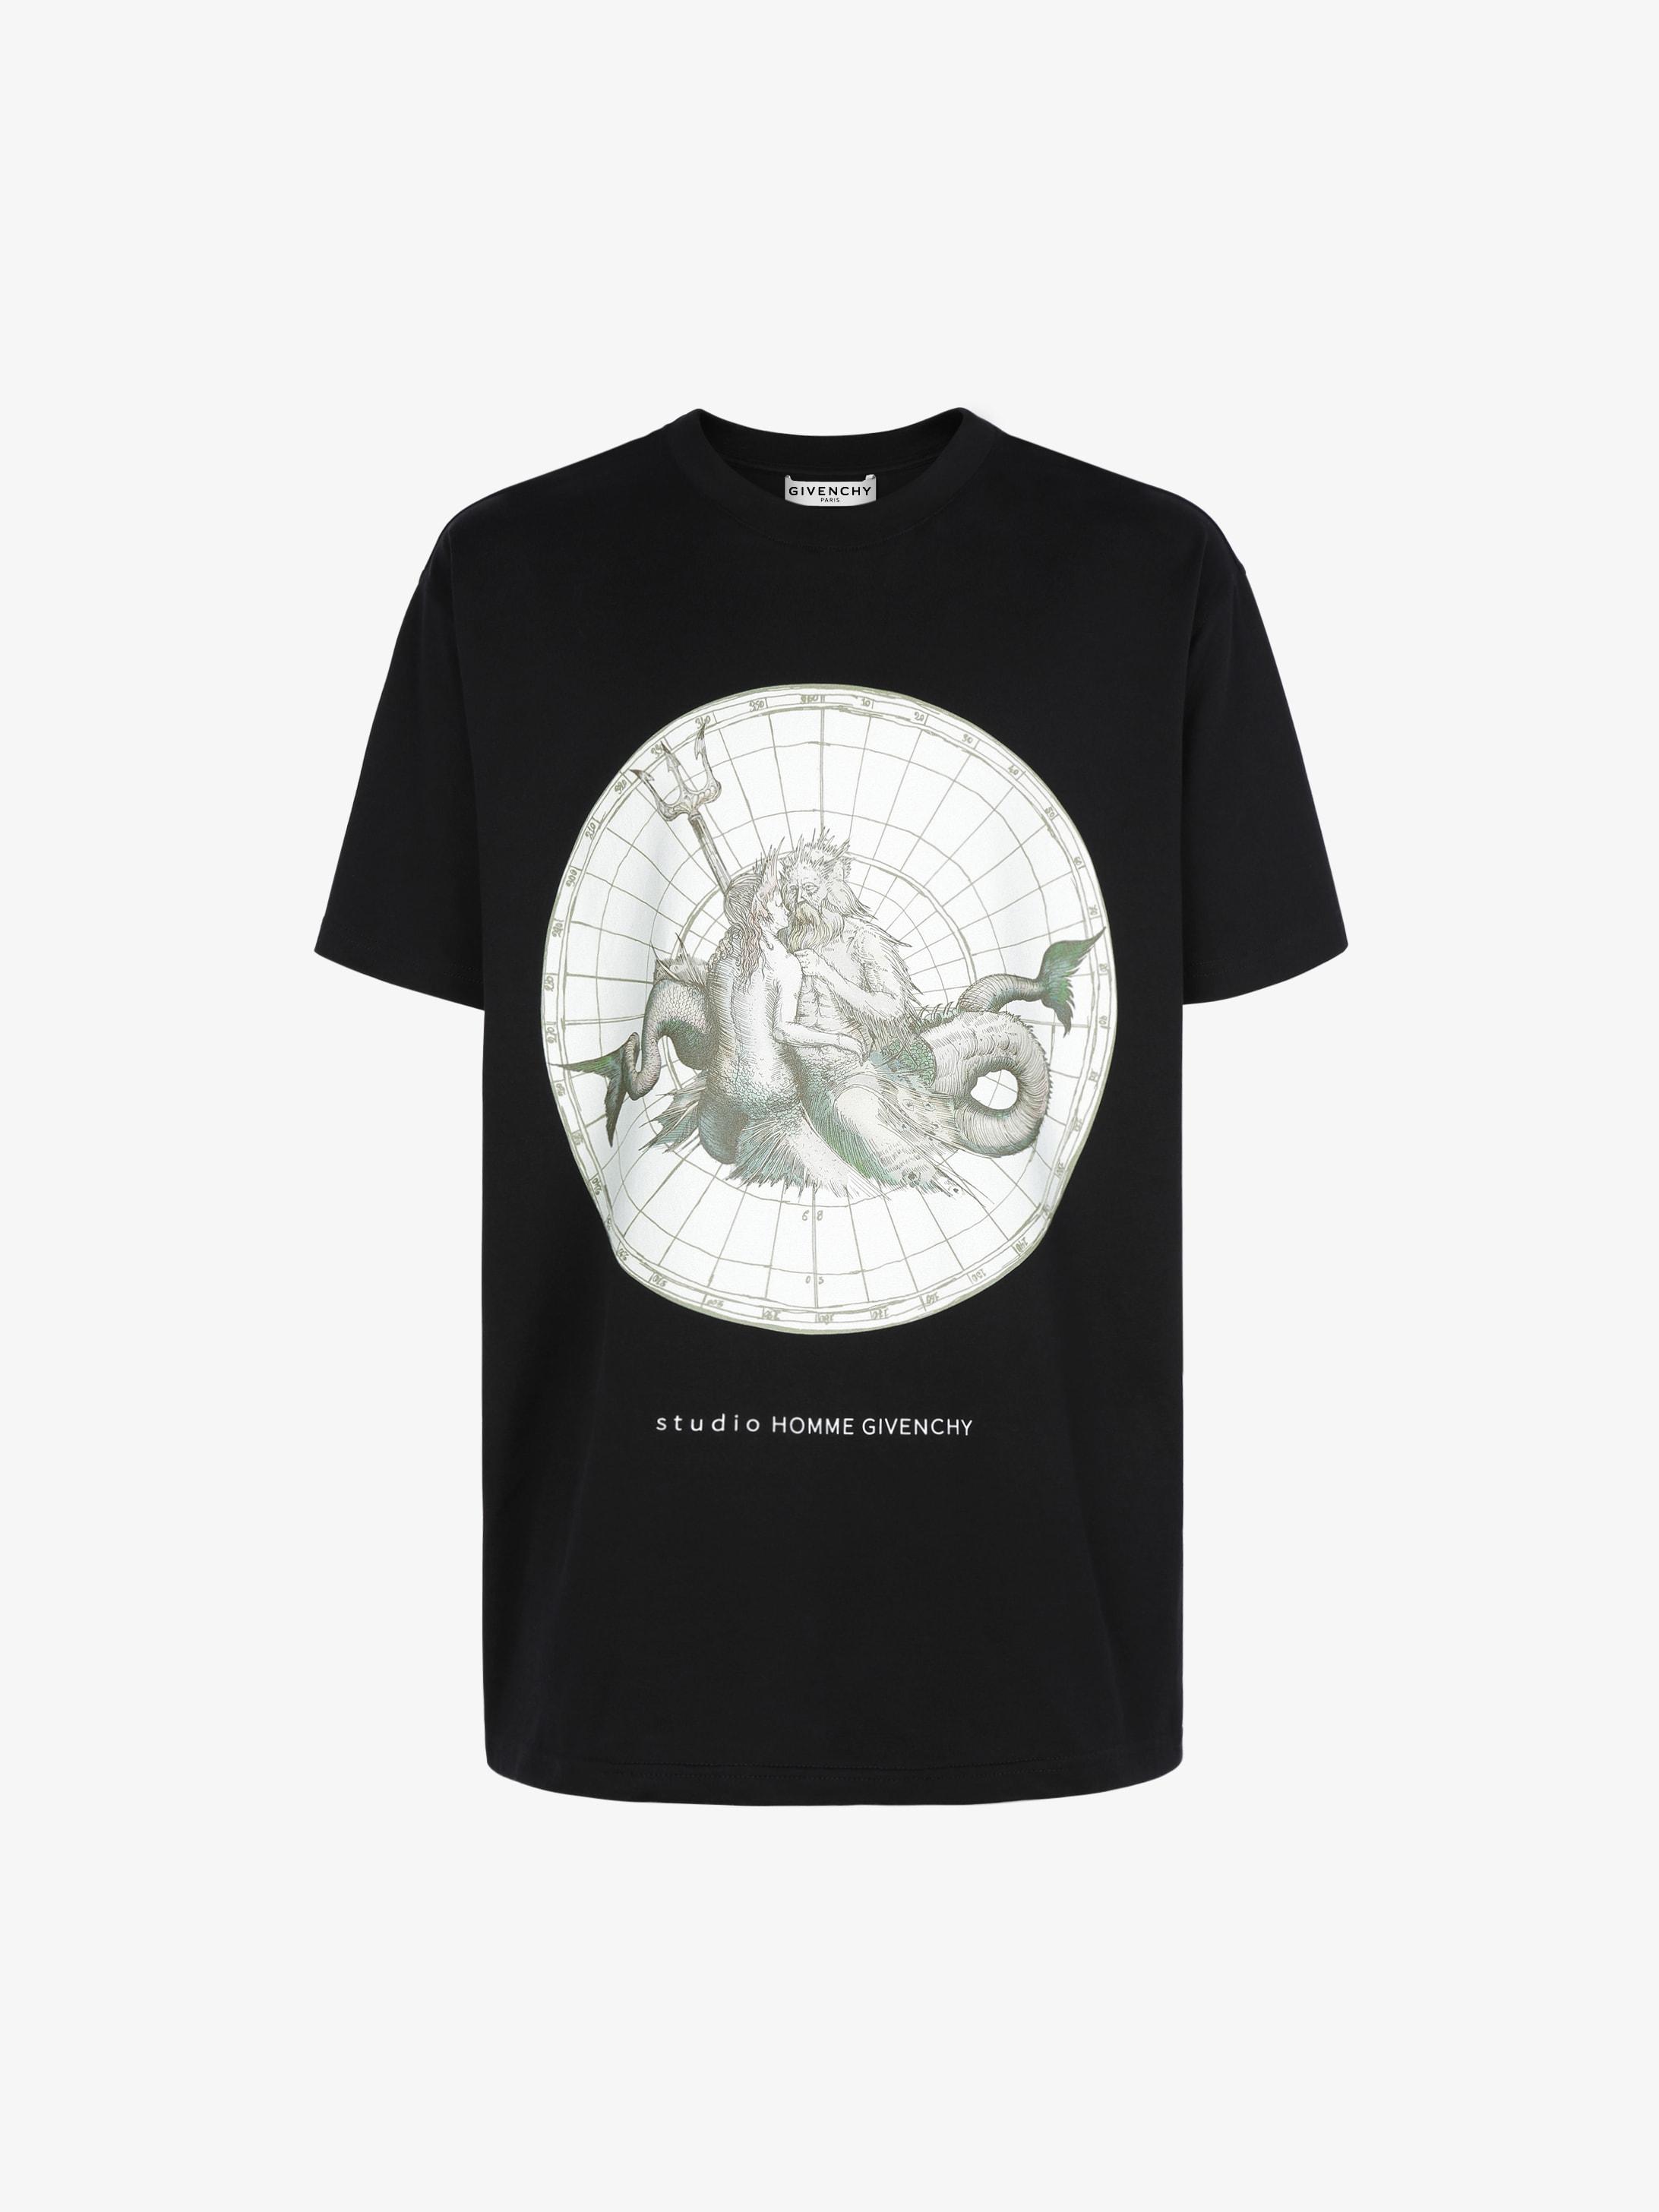 T-shirt oversized imprimé Poséidon